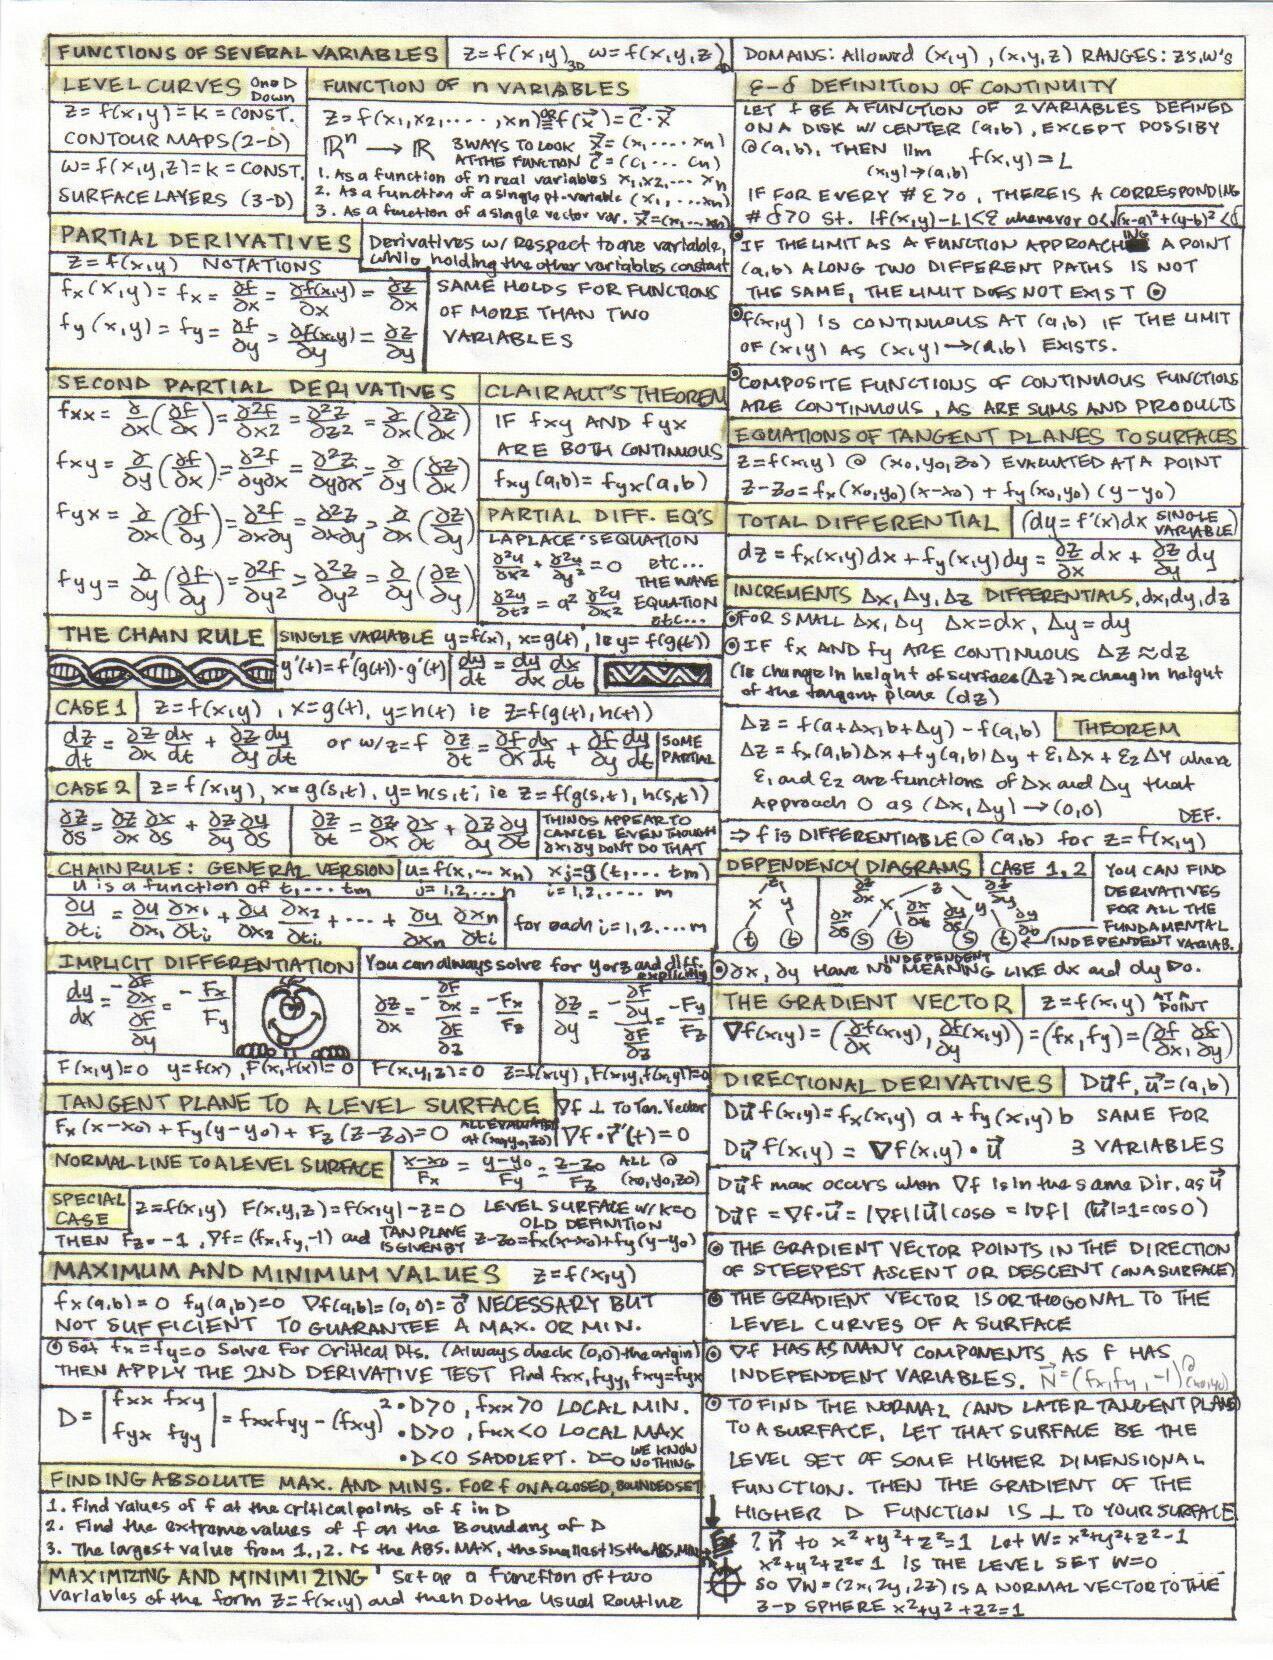 math cheat sheets - Google Search | Brain | Pinterest | Math, Google ...